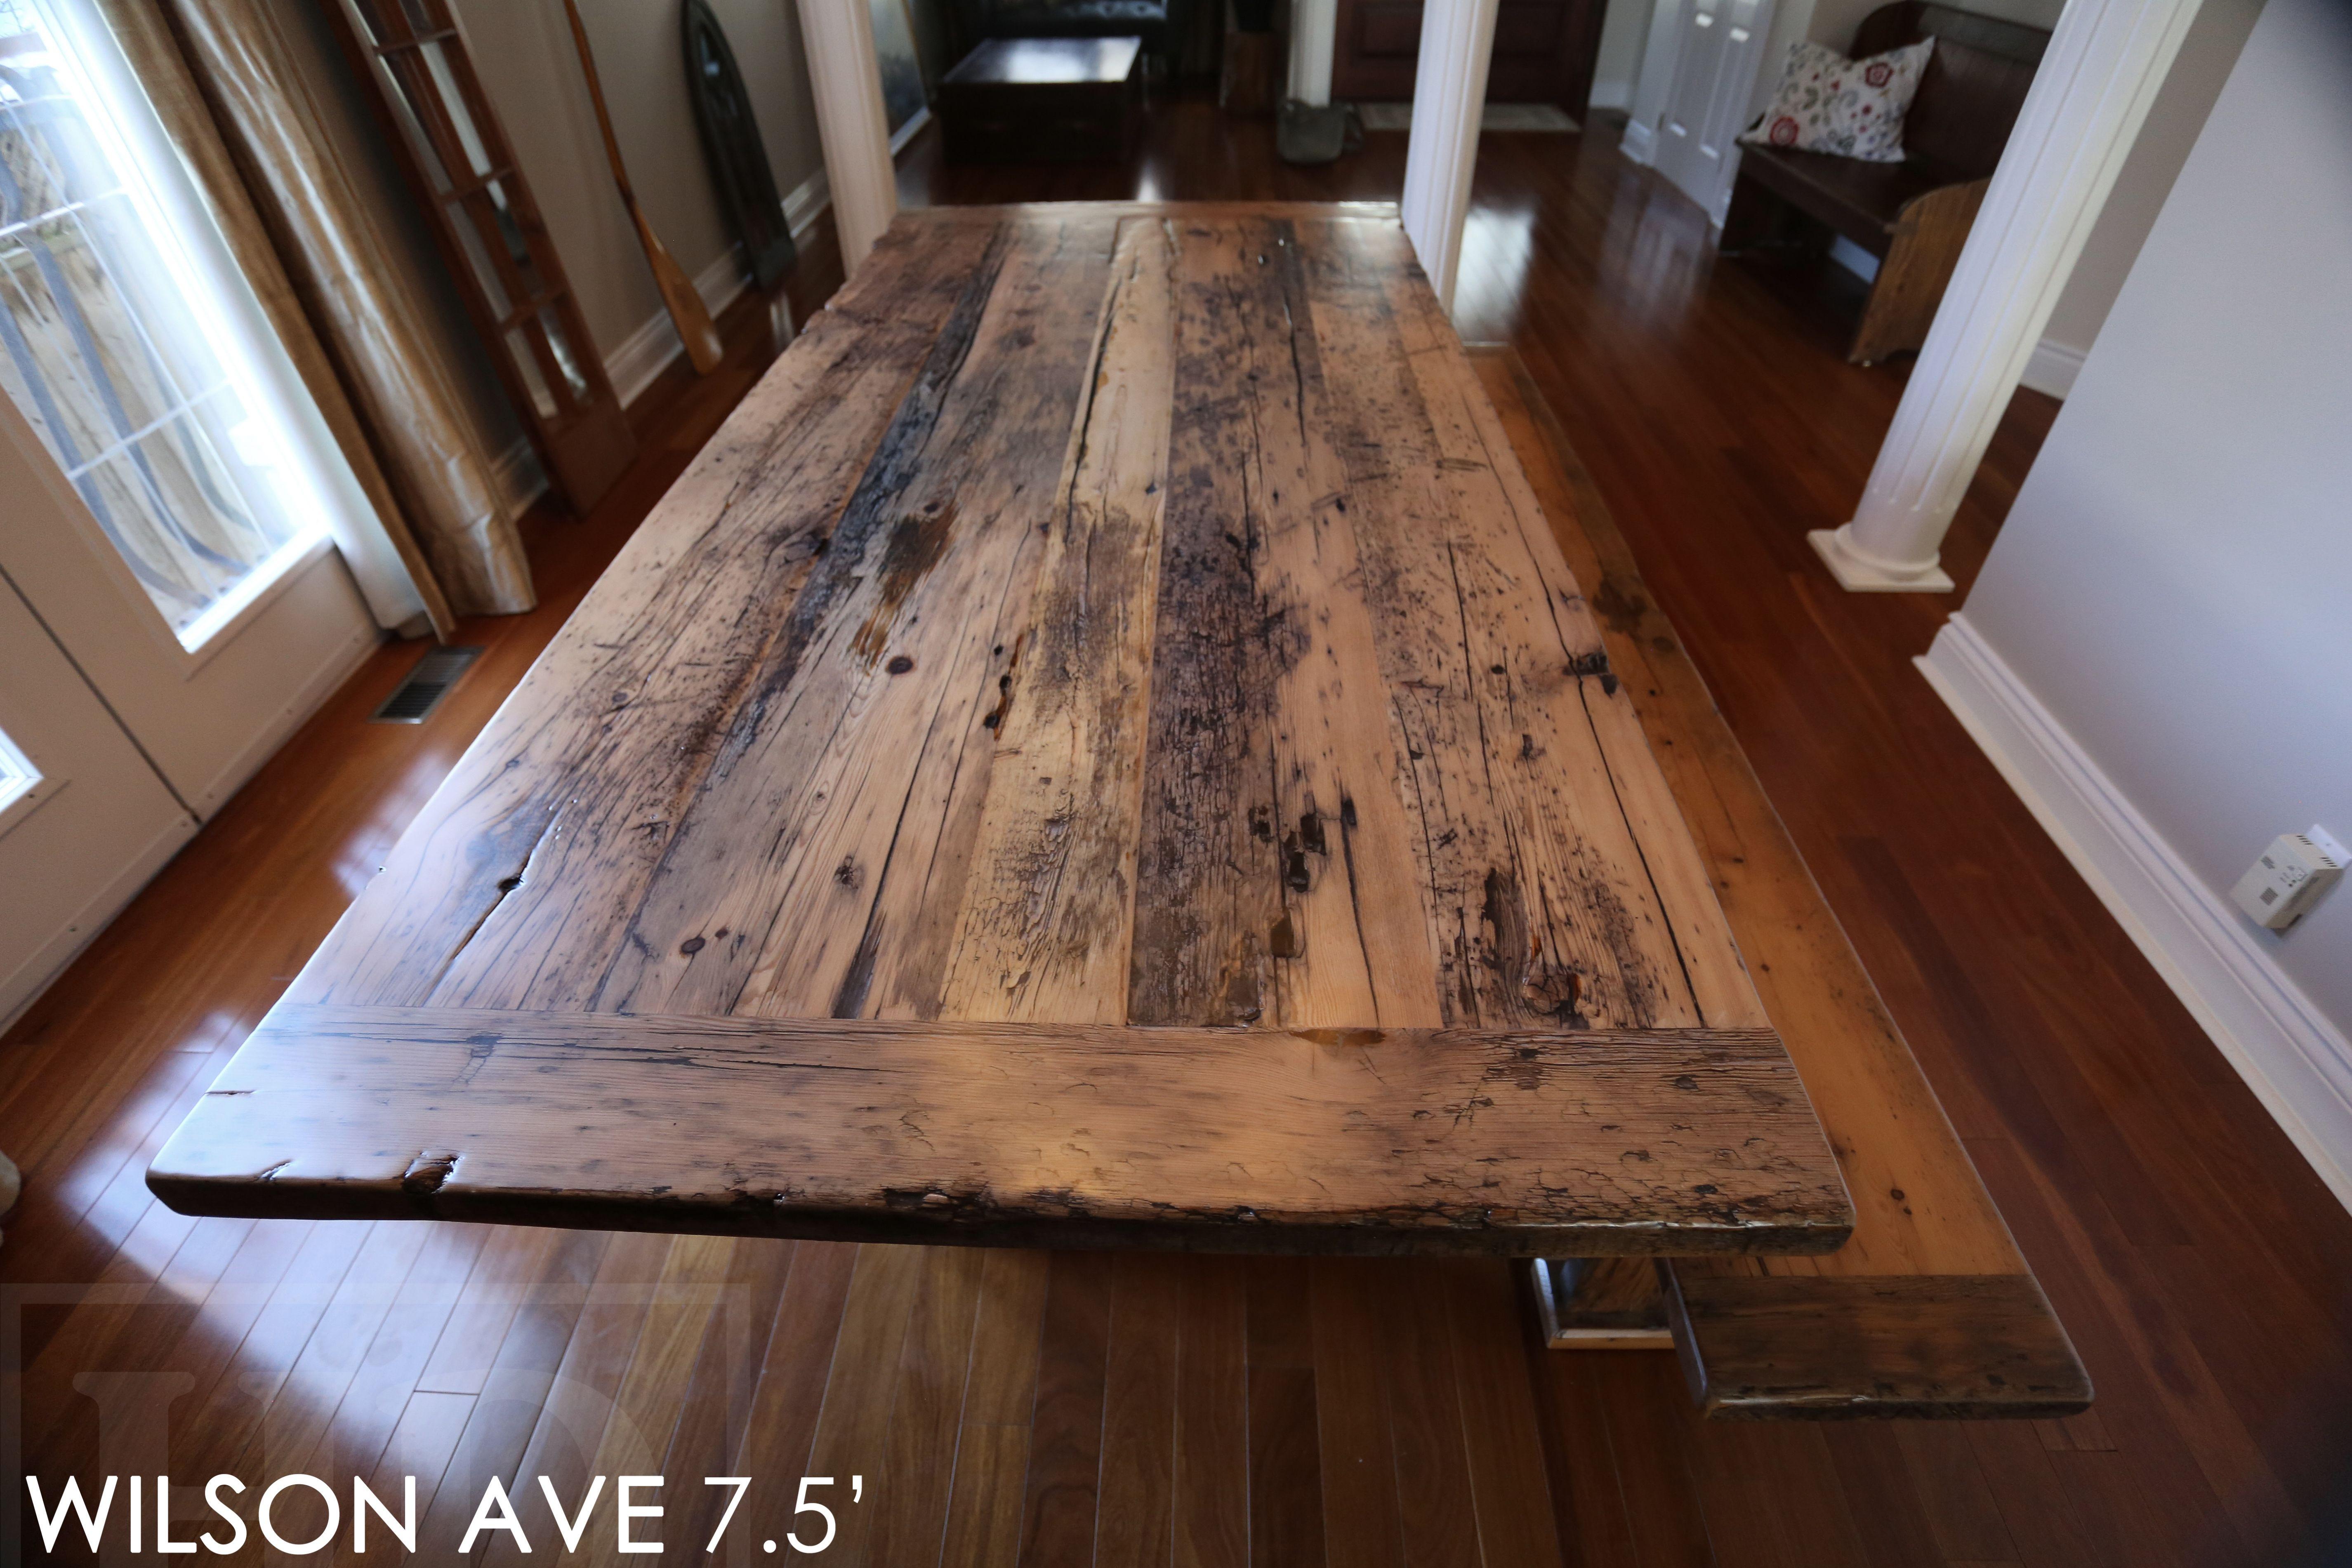 hardwood flooring deals ontario of reclaimed wood plank base table by hd threshing floor furniture of with reclaimed wood plank base table by hd threshing floor furniture of cambridge ontario www